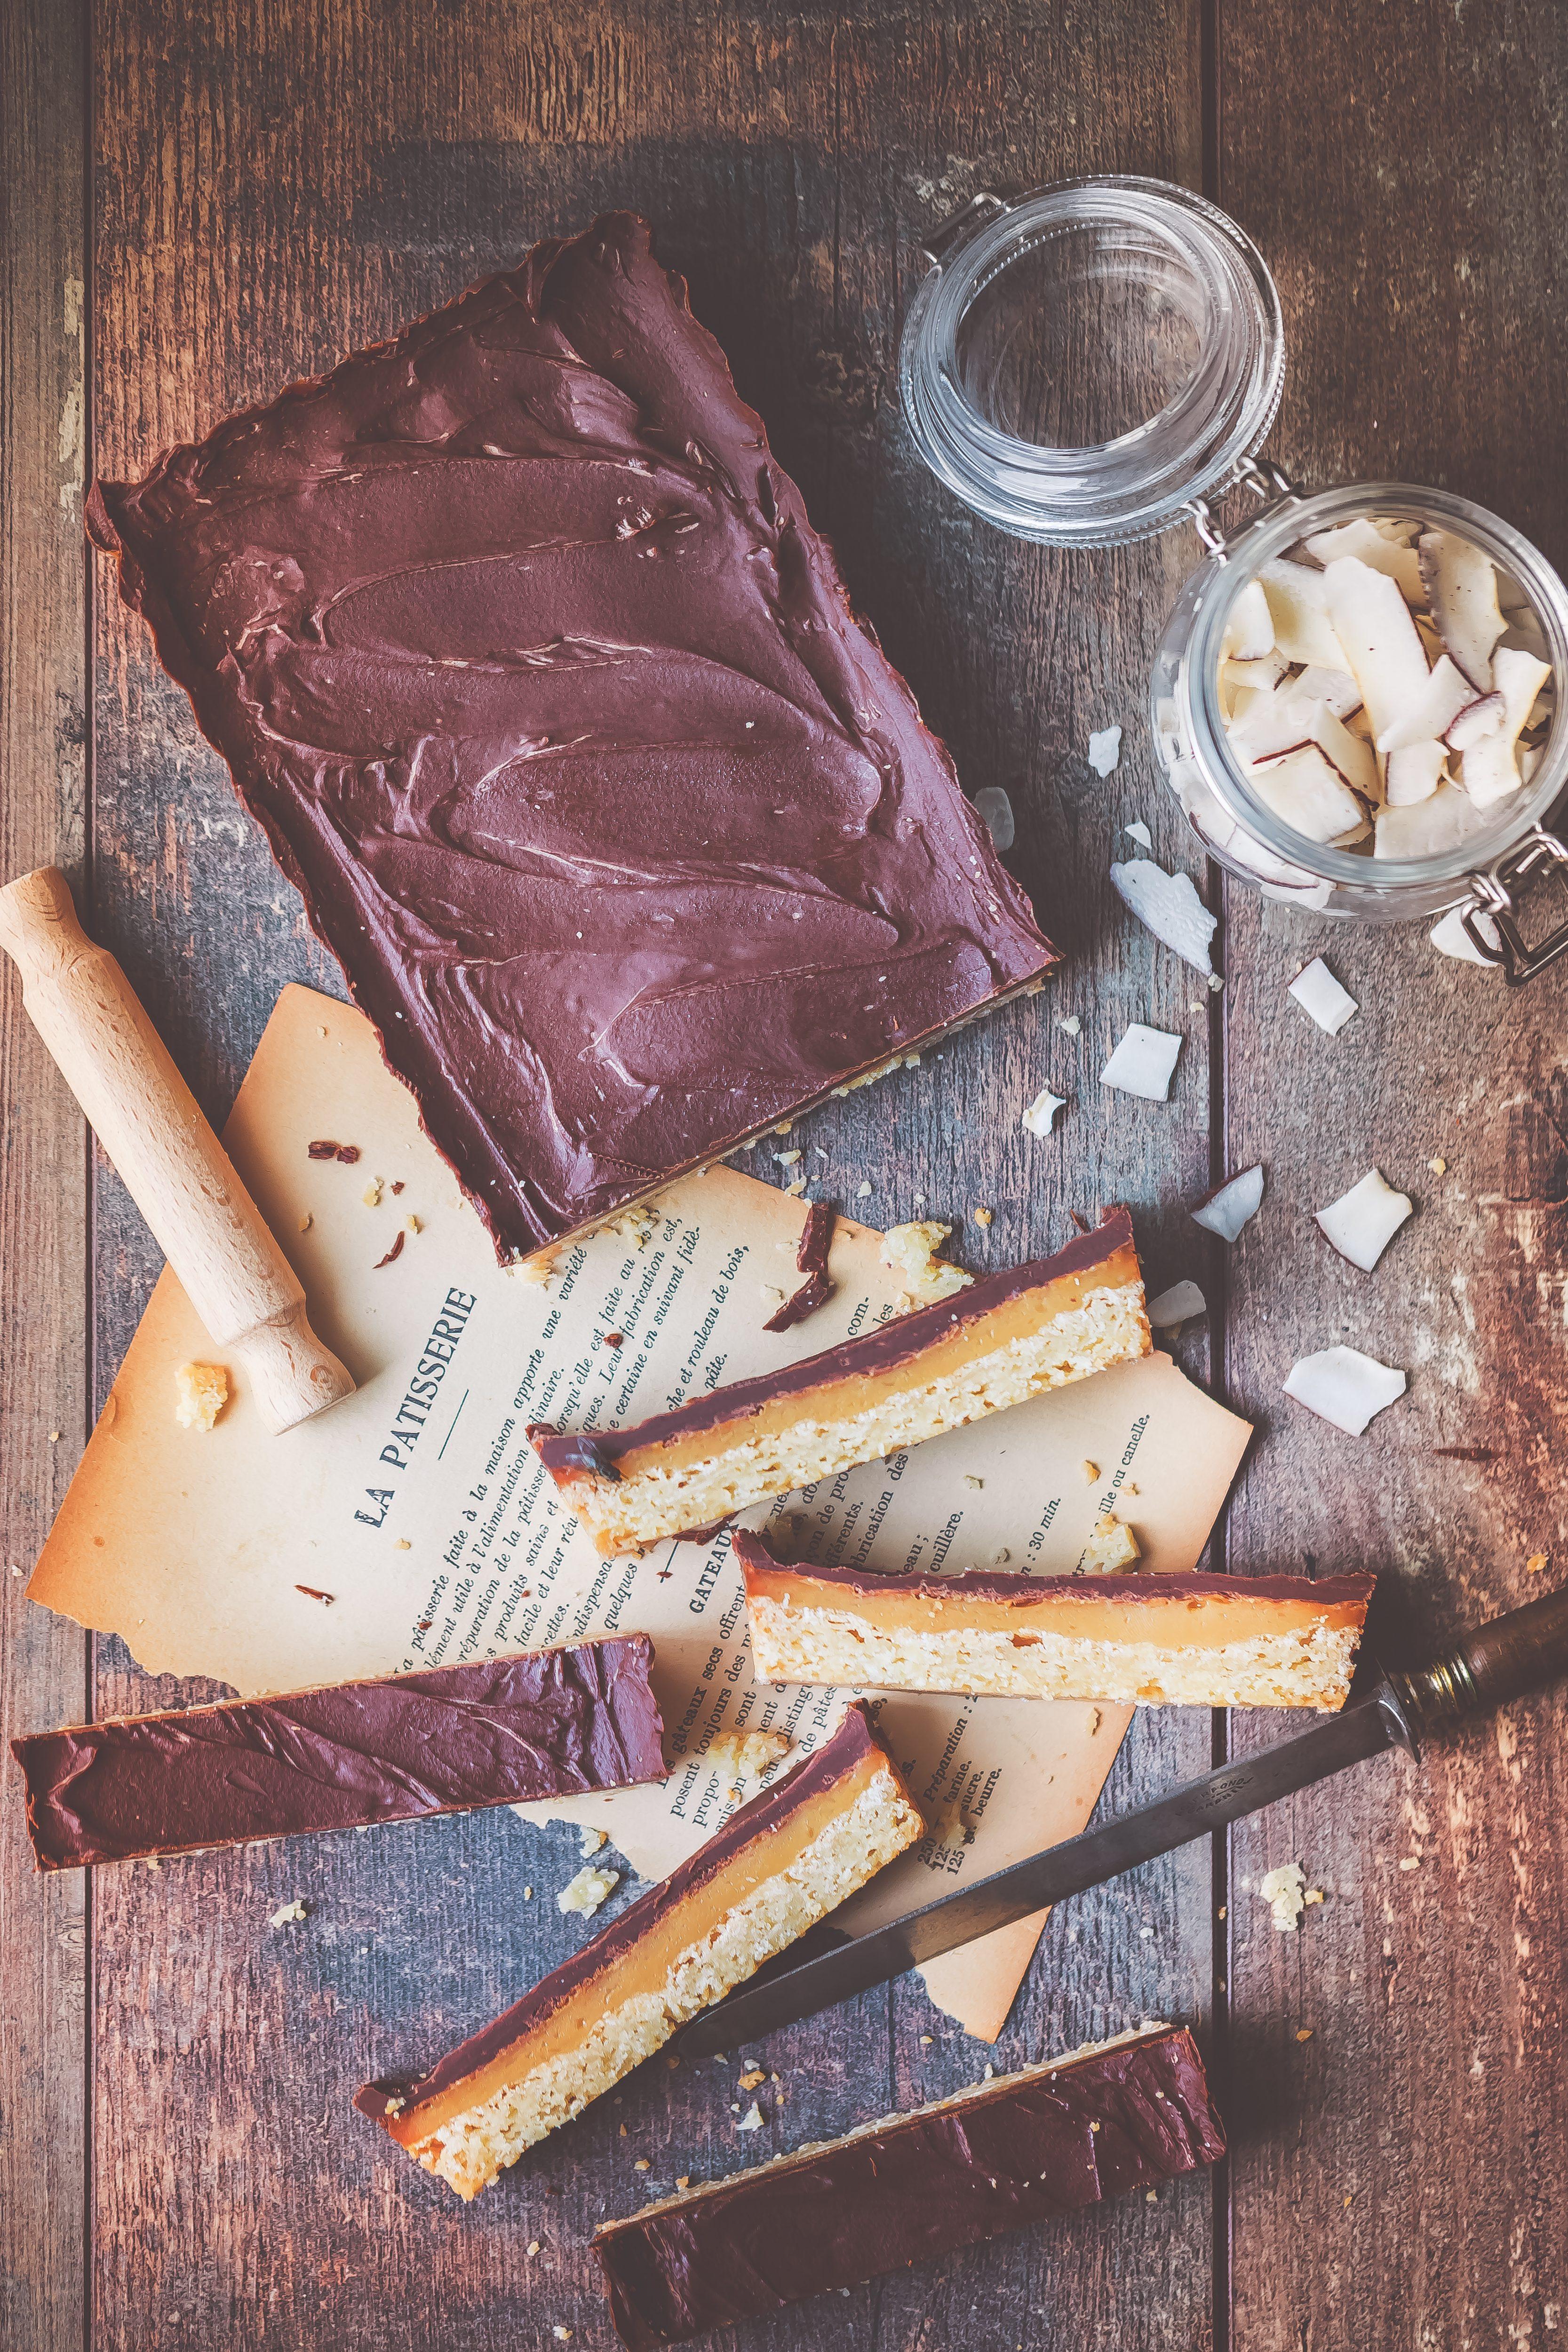 Recette facile Biscuits Coco, Caramel et Chocolat